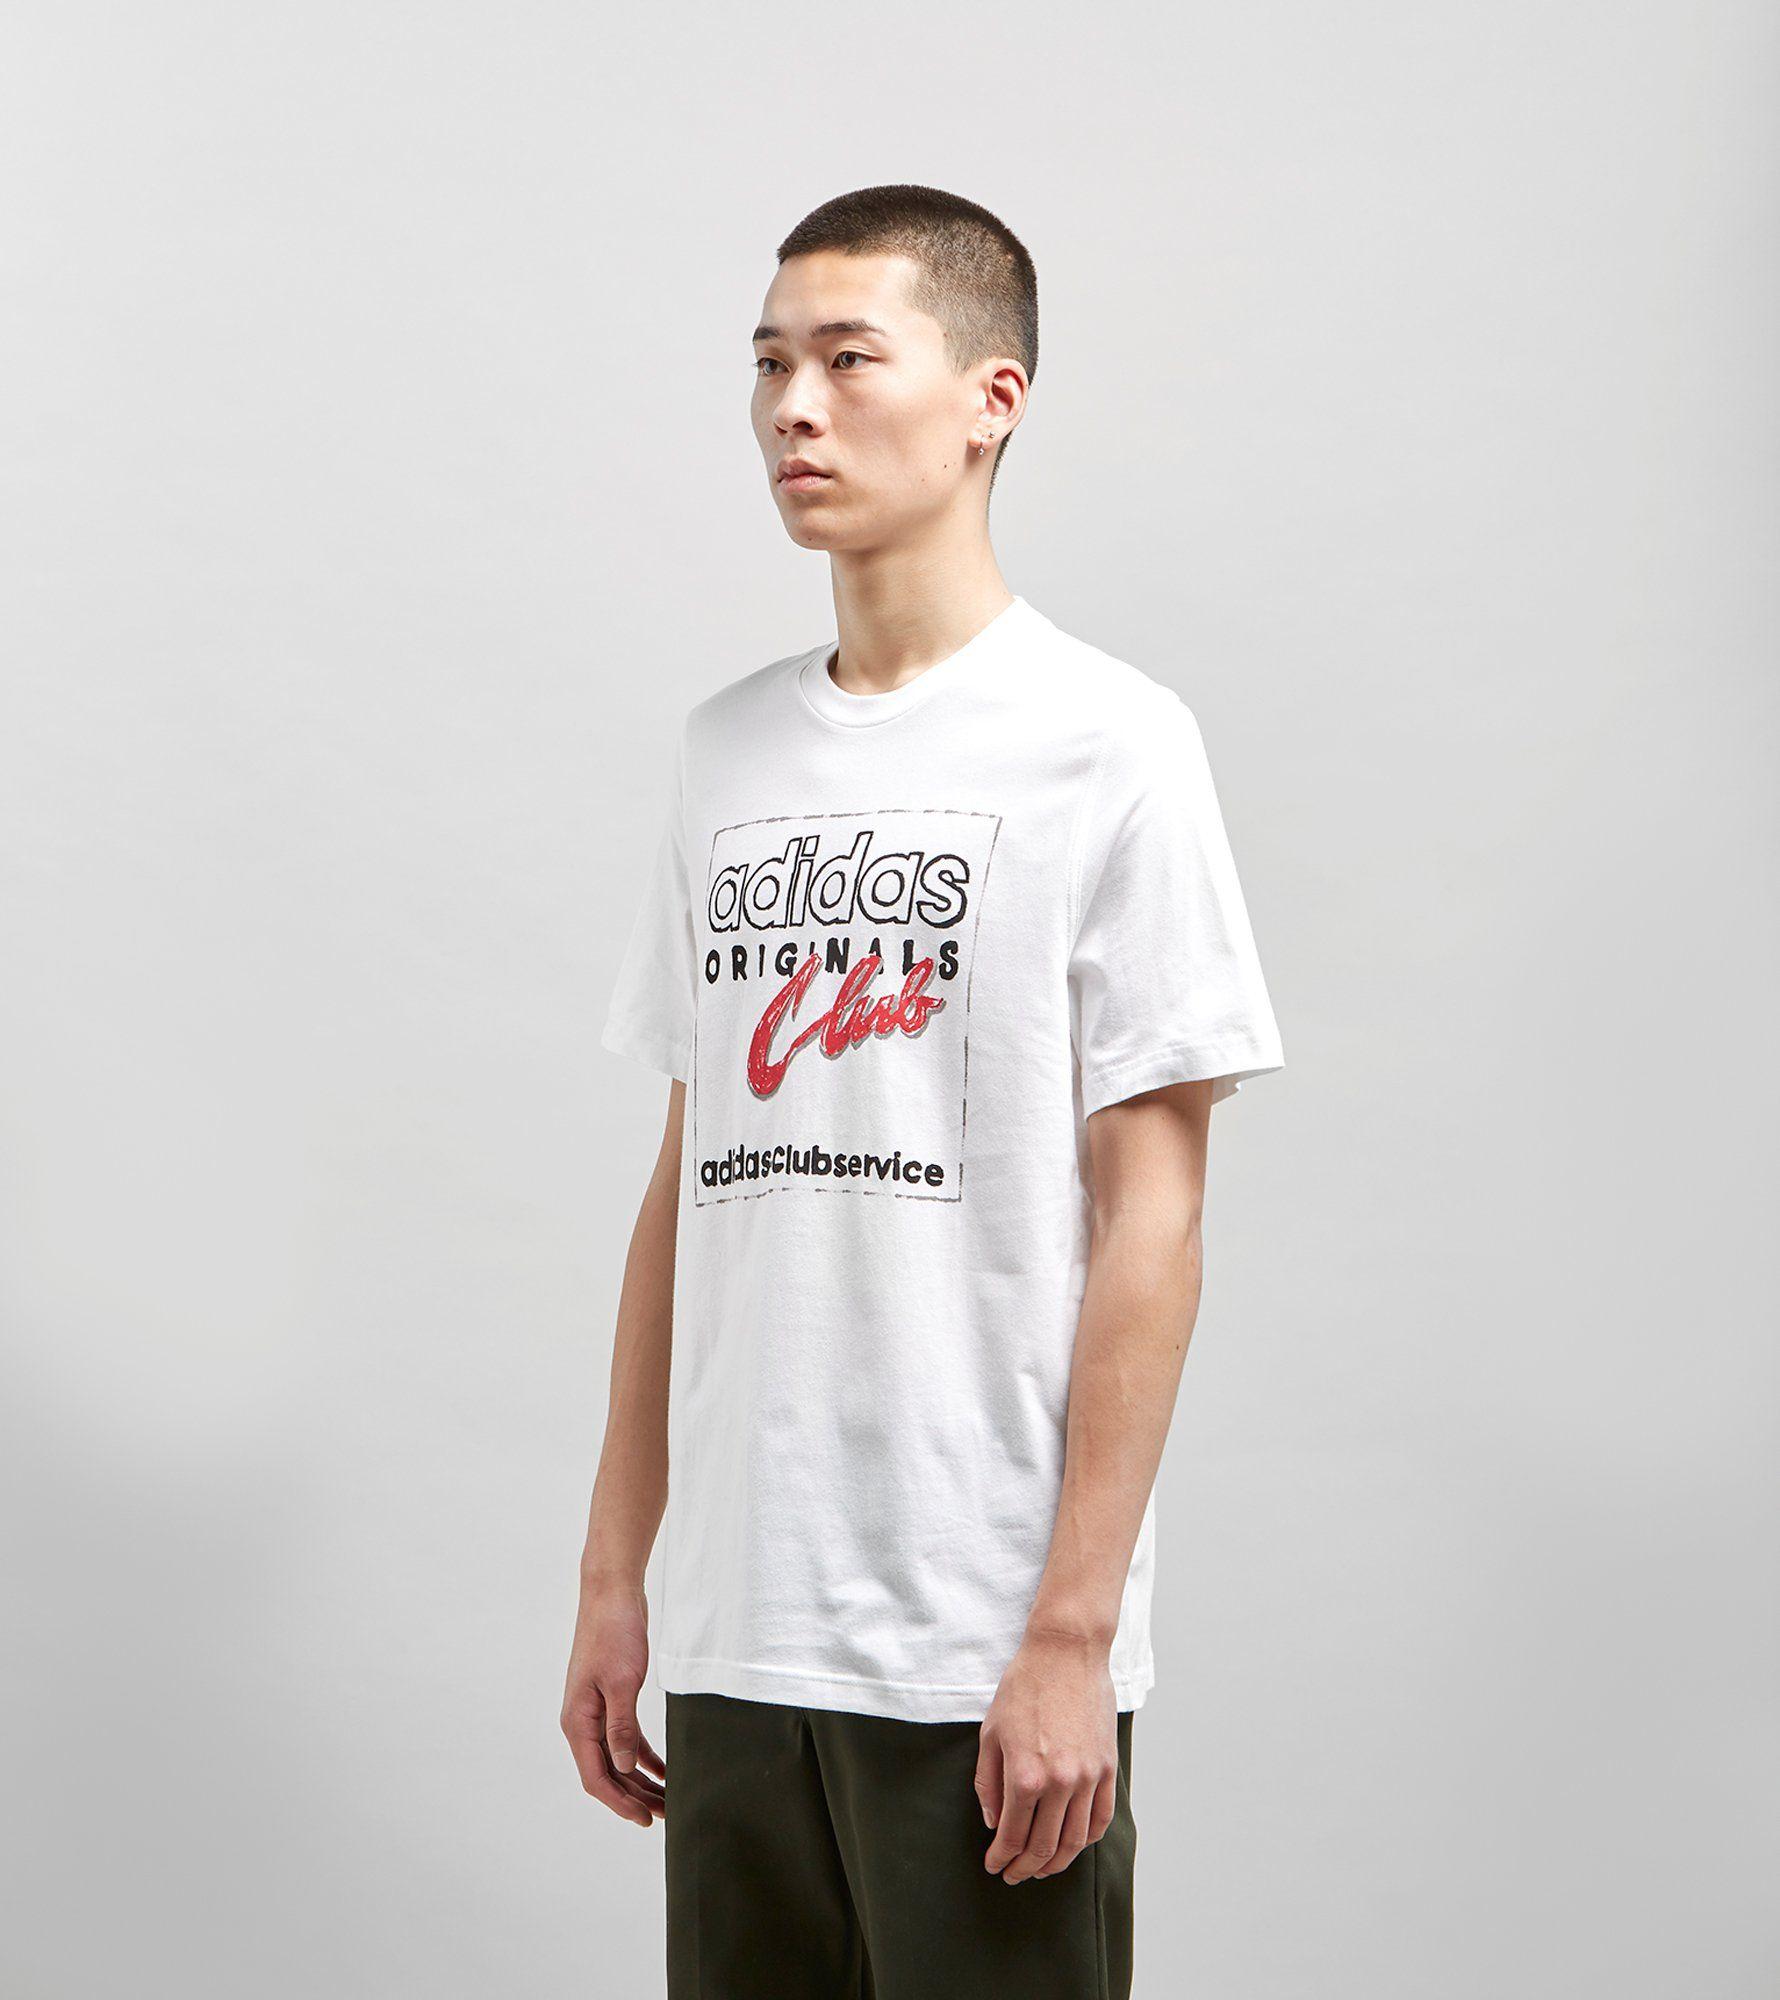 adidas Originals T-Shirt Hand Drawn